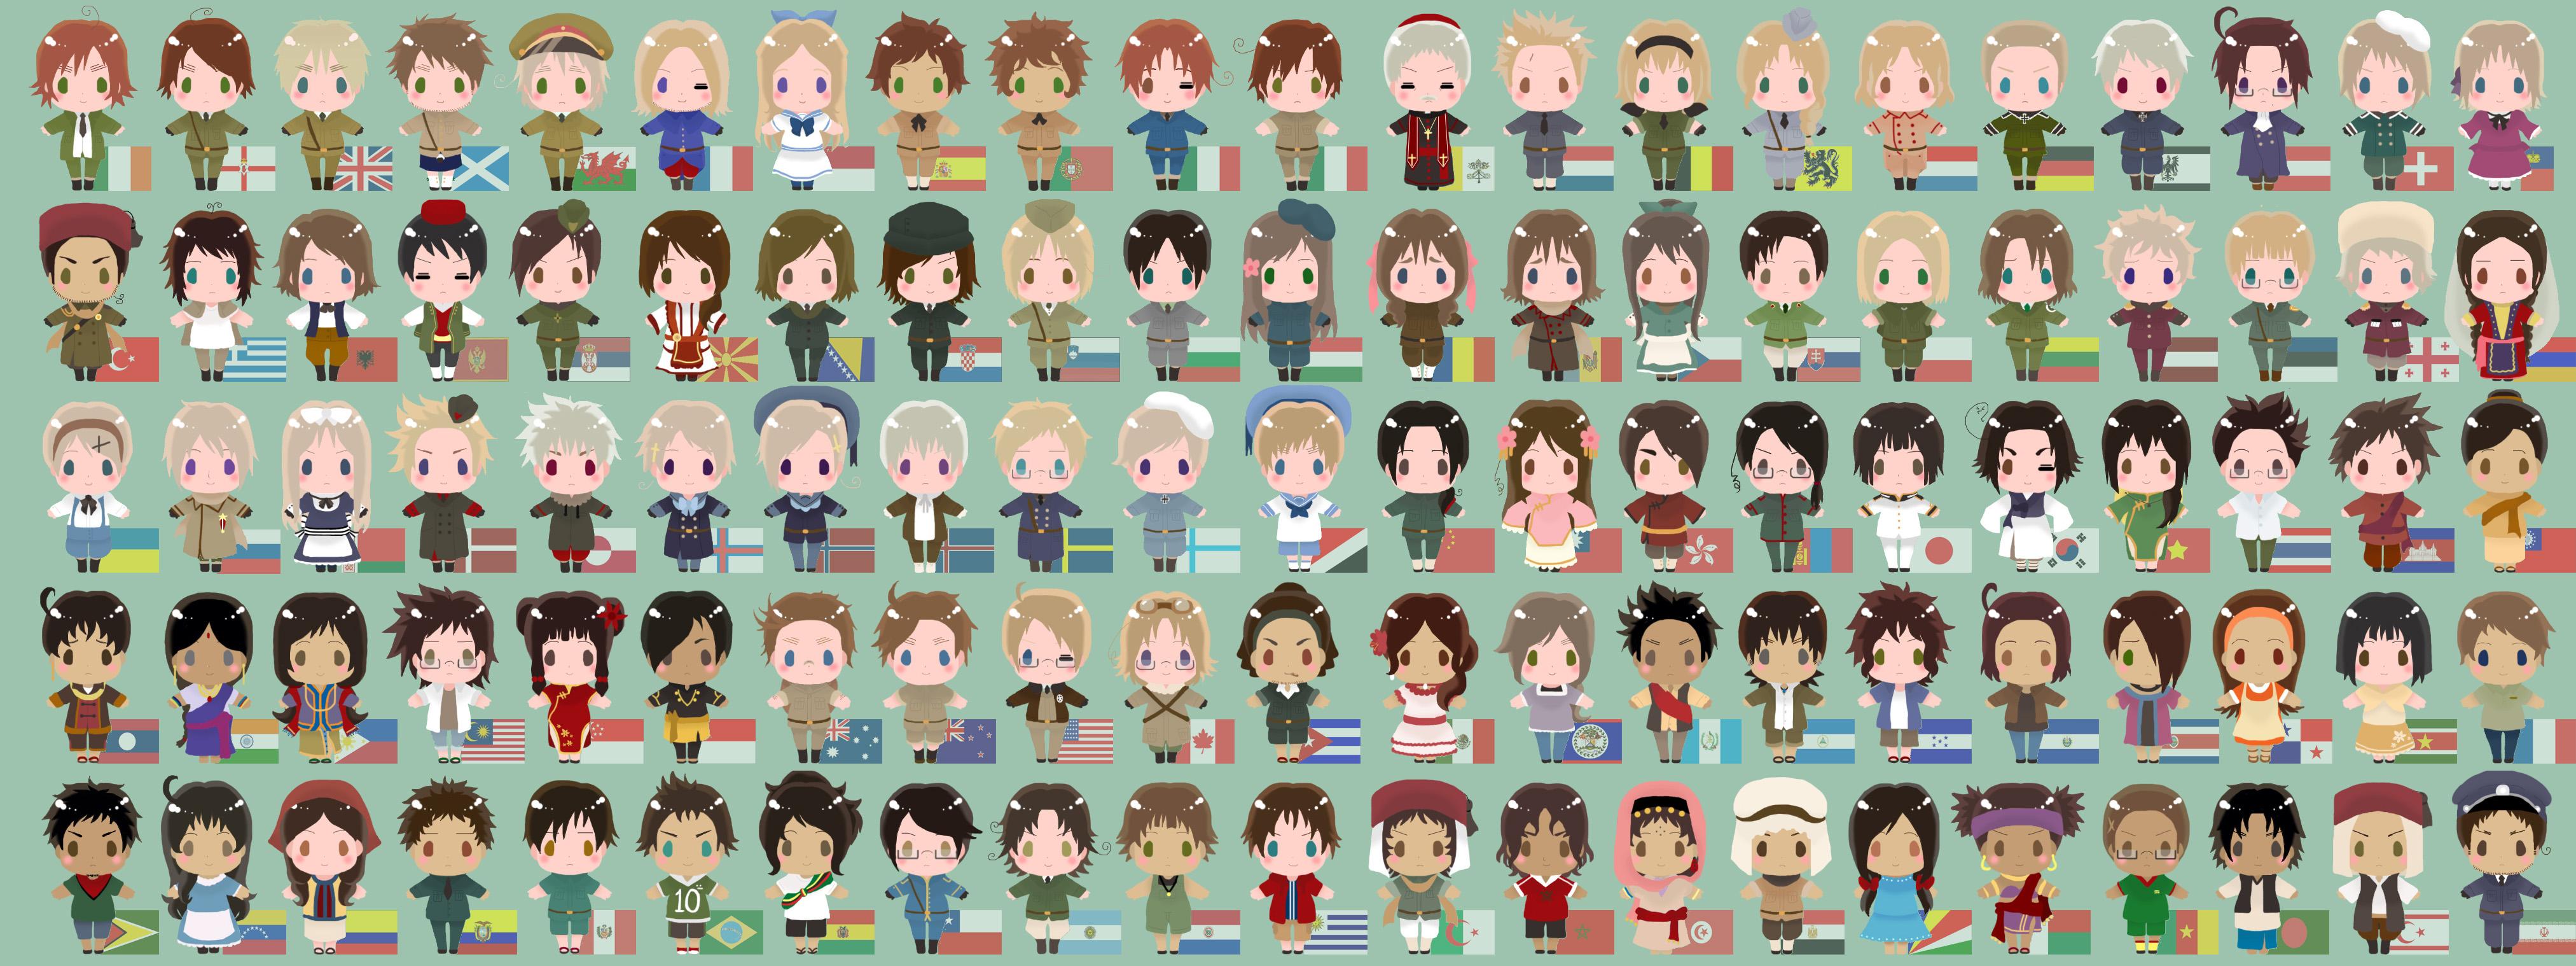 Anime Characters Powers : Hetalia anime characters gallery